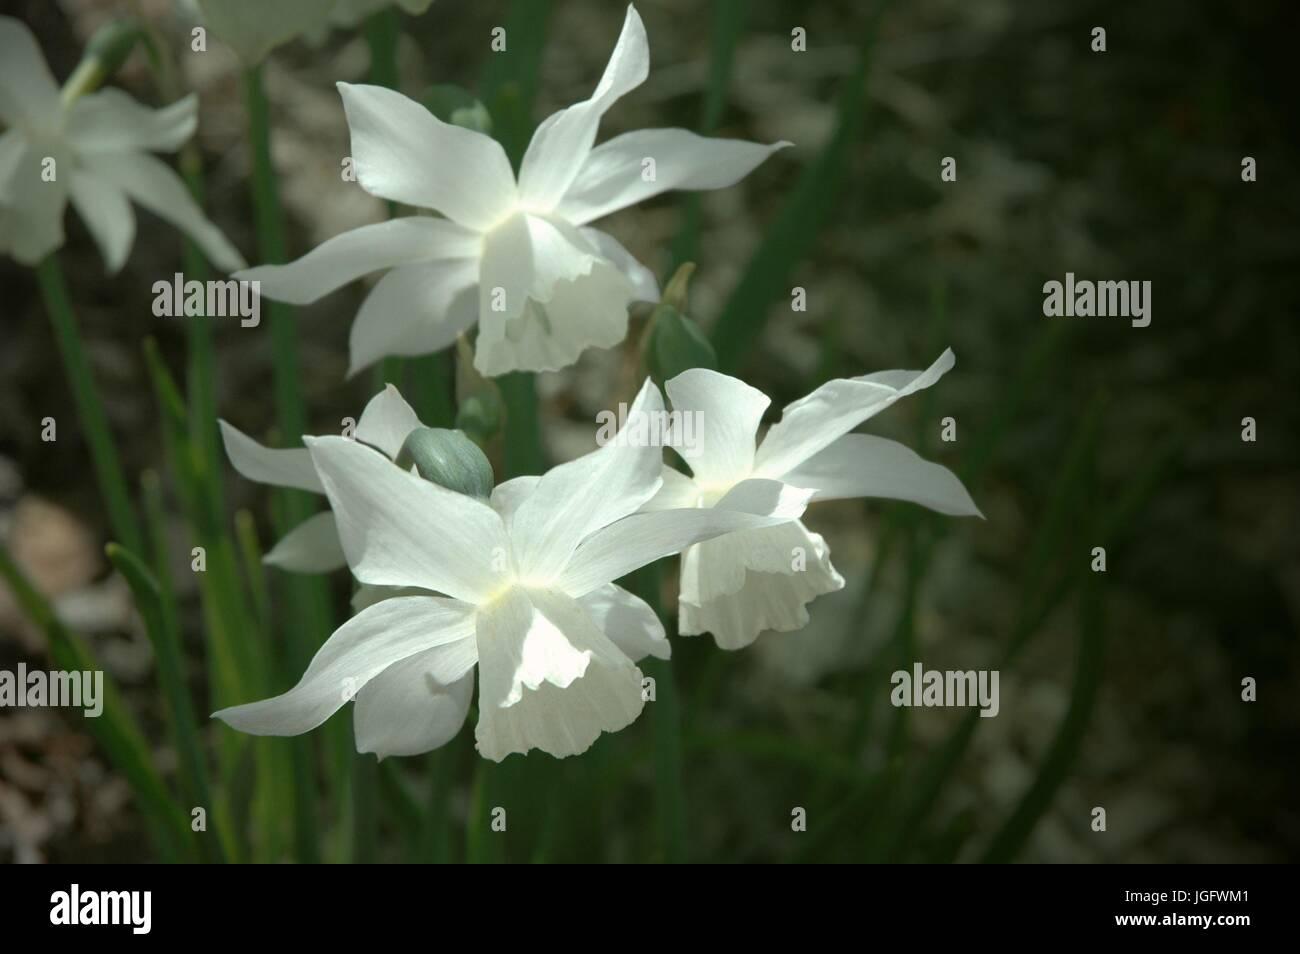 elegant white jonquils blooming in the early morning light Stock Photo